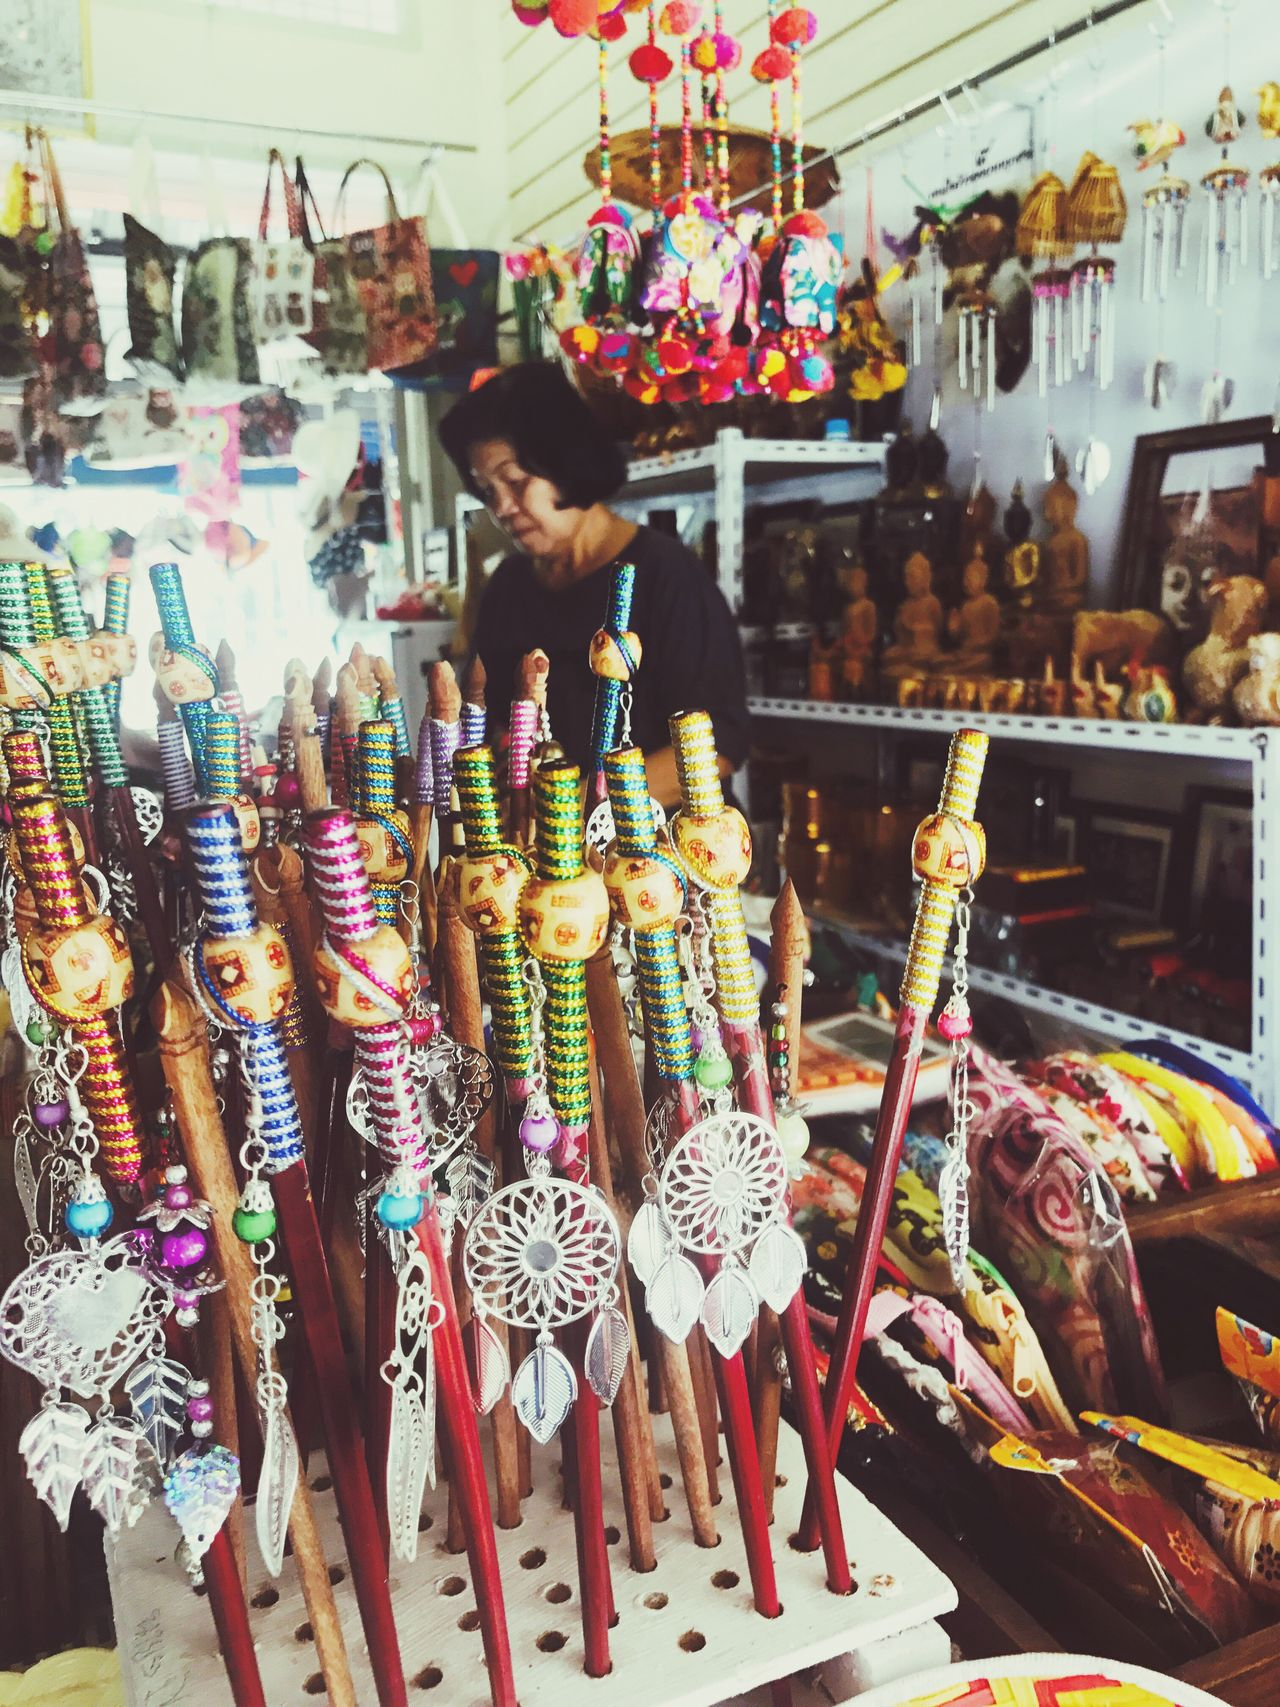 Souviner Lifestyles Life Sukhothai Sukhothaihistoricalpark Thailand Culture Hipster Barrette